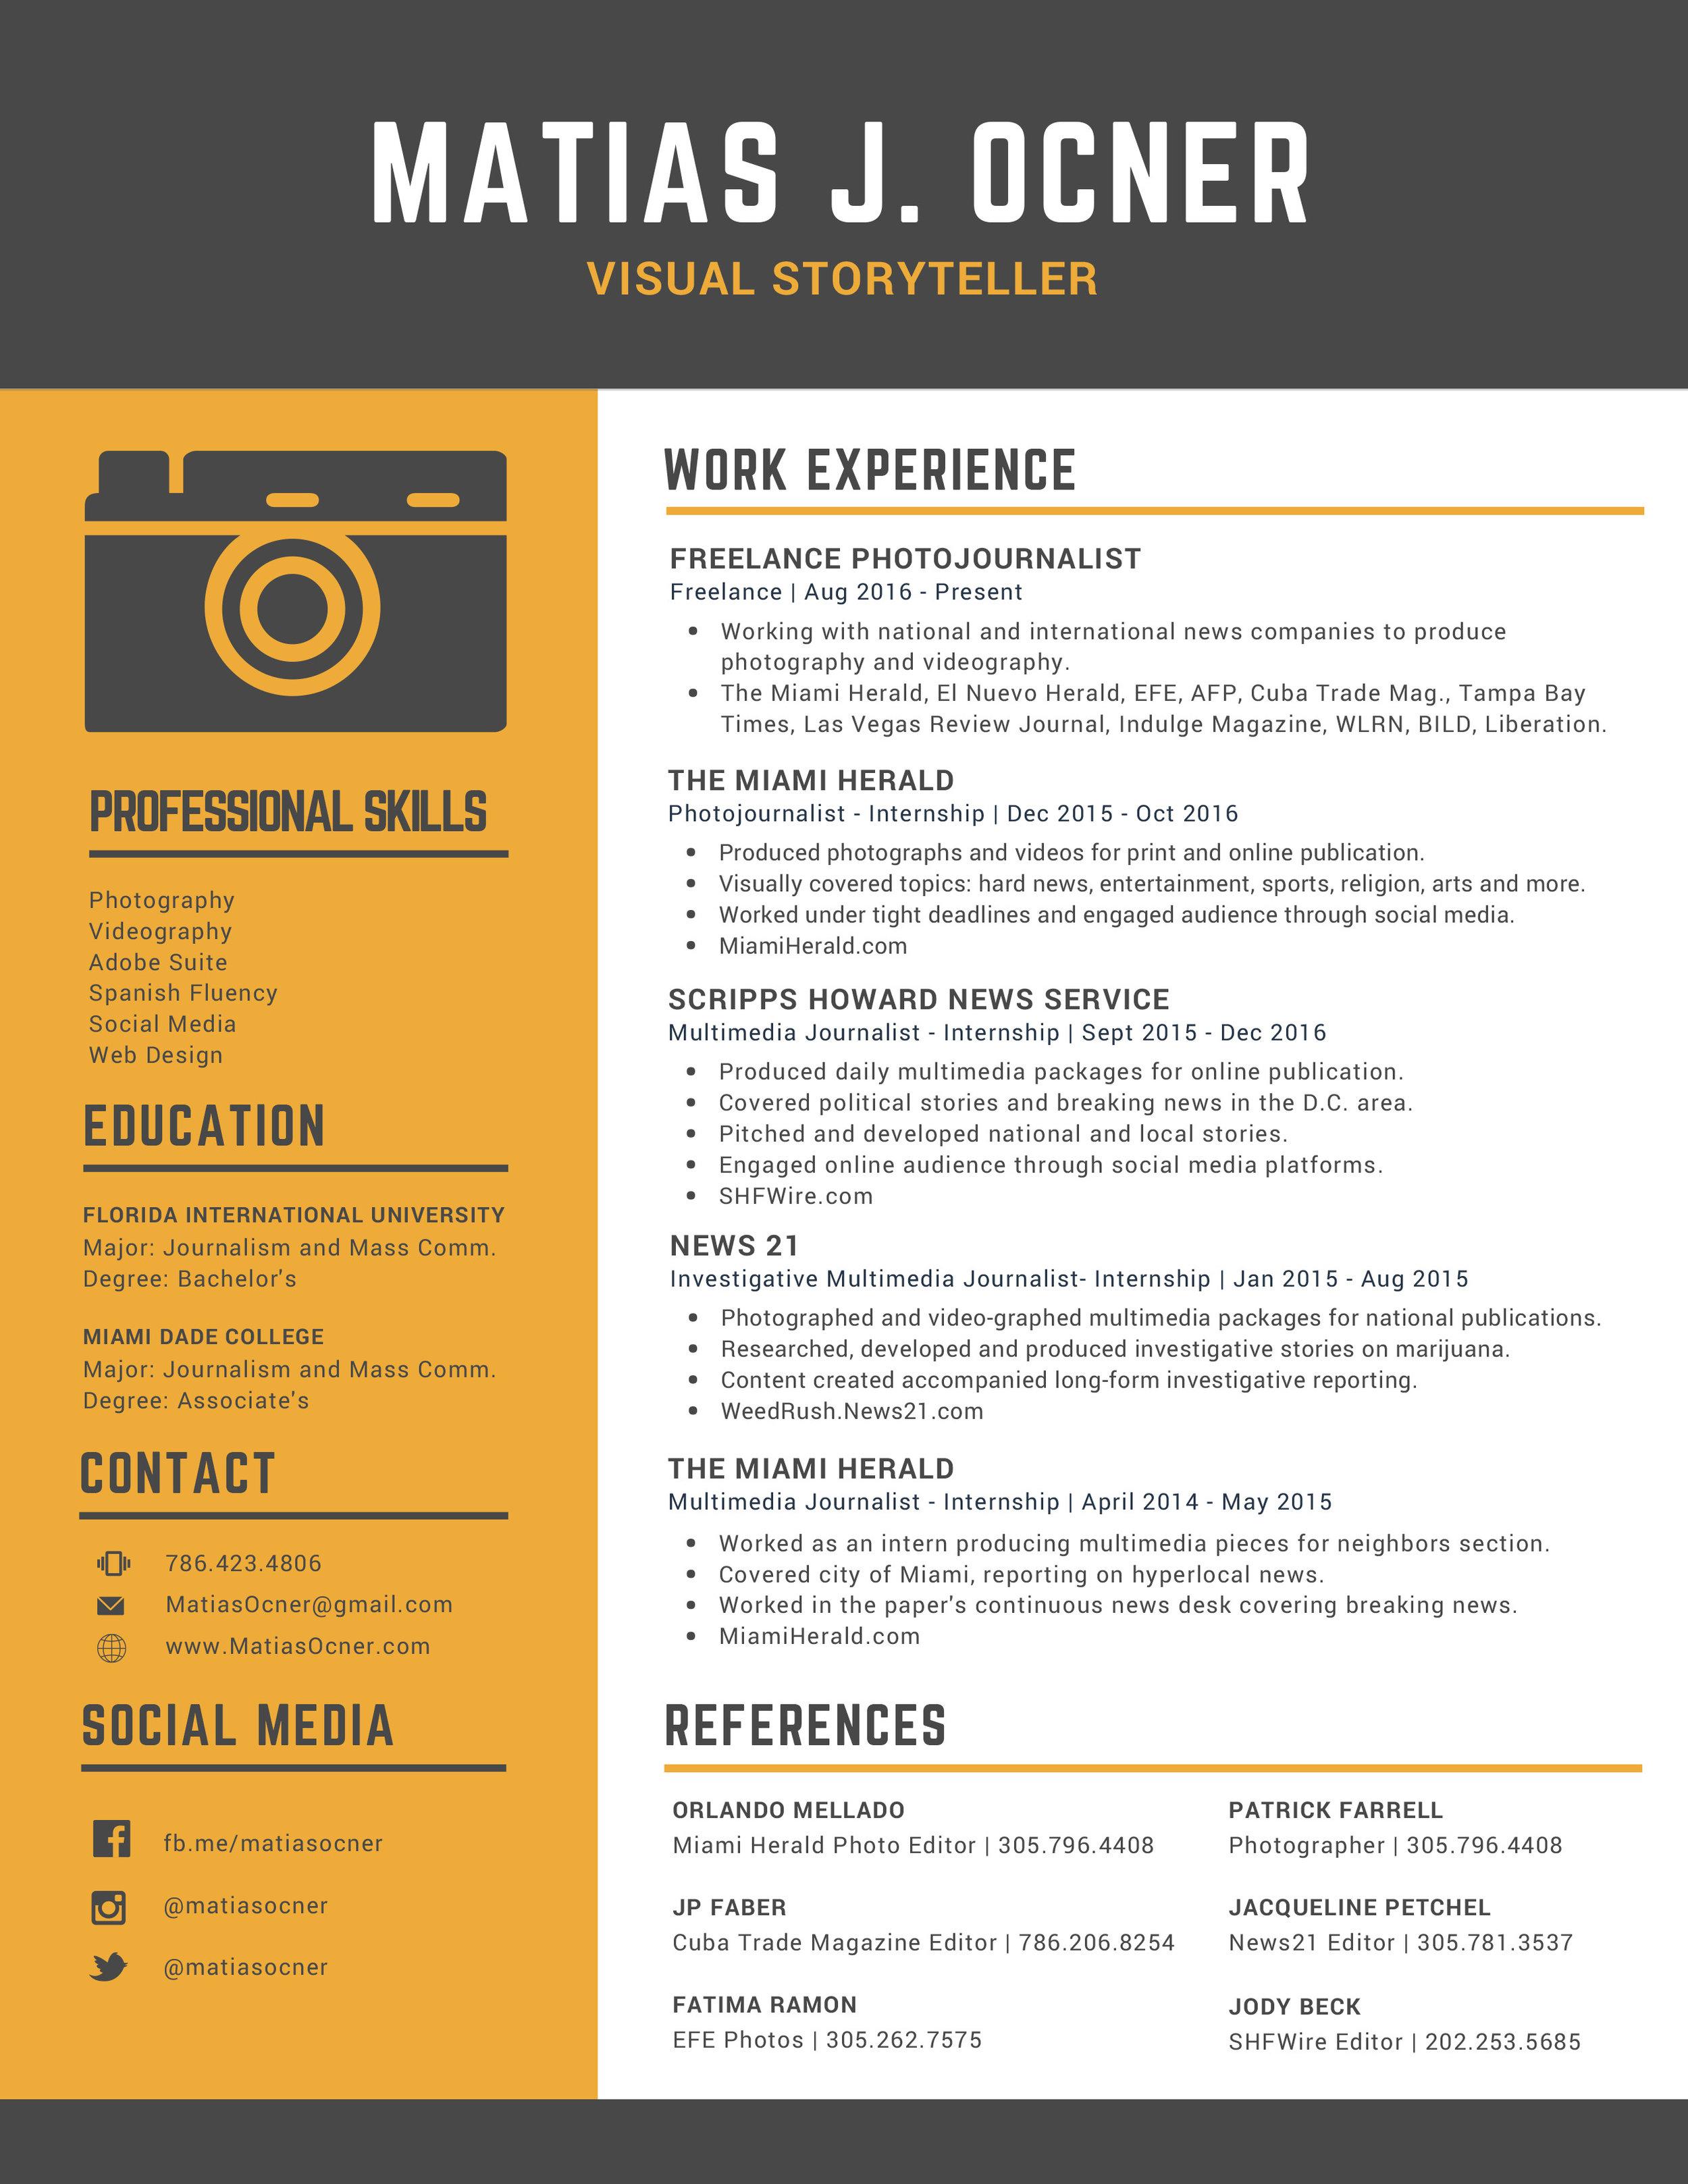 matias-j-ocner-resume-3.jpg